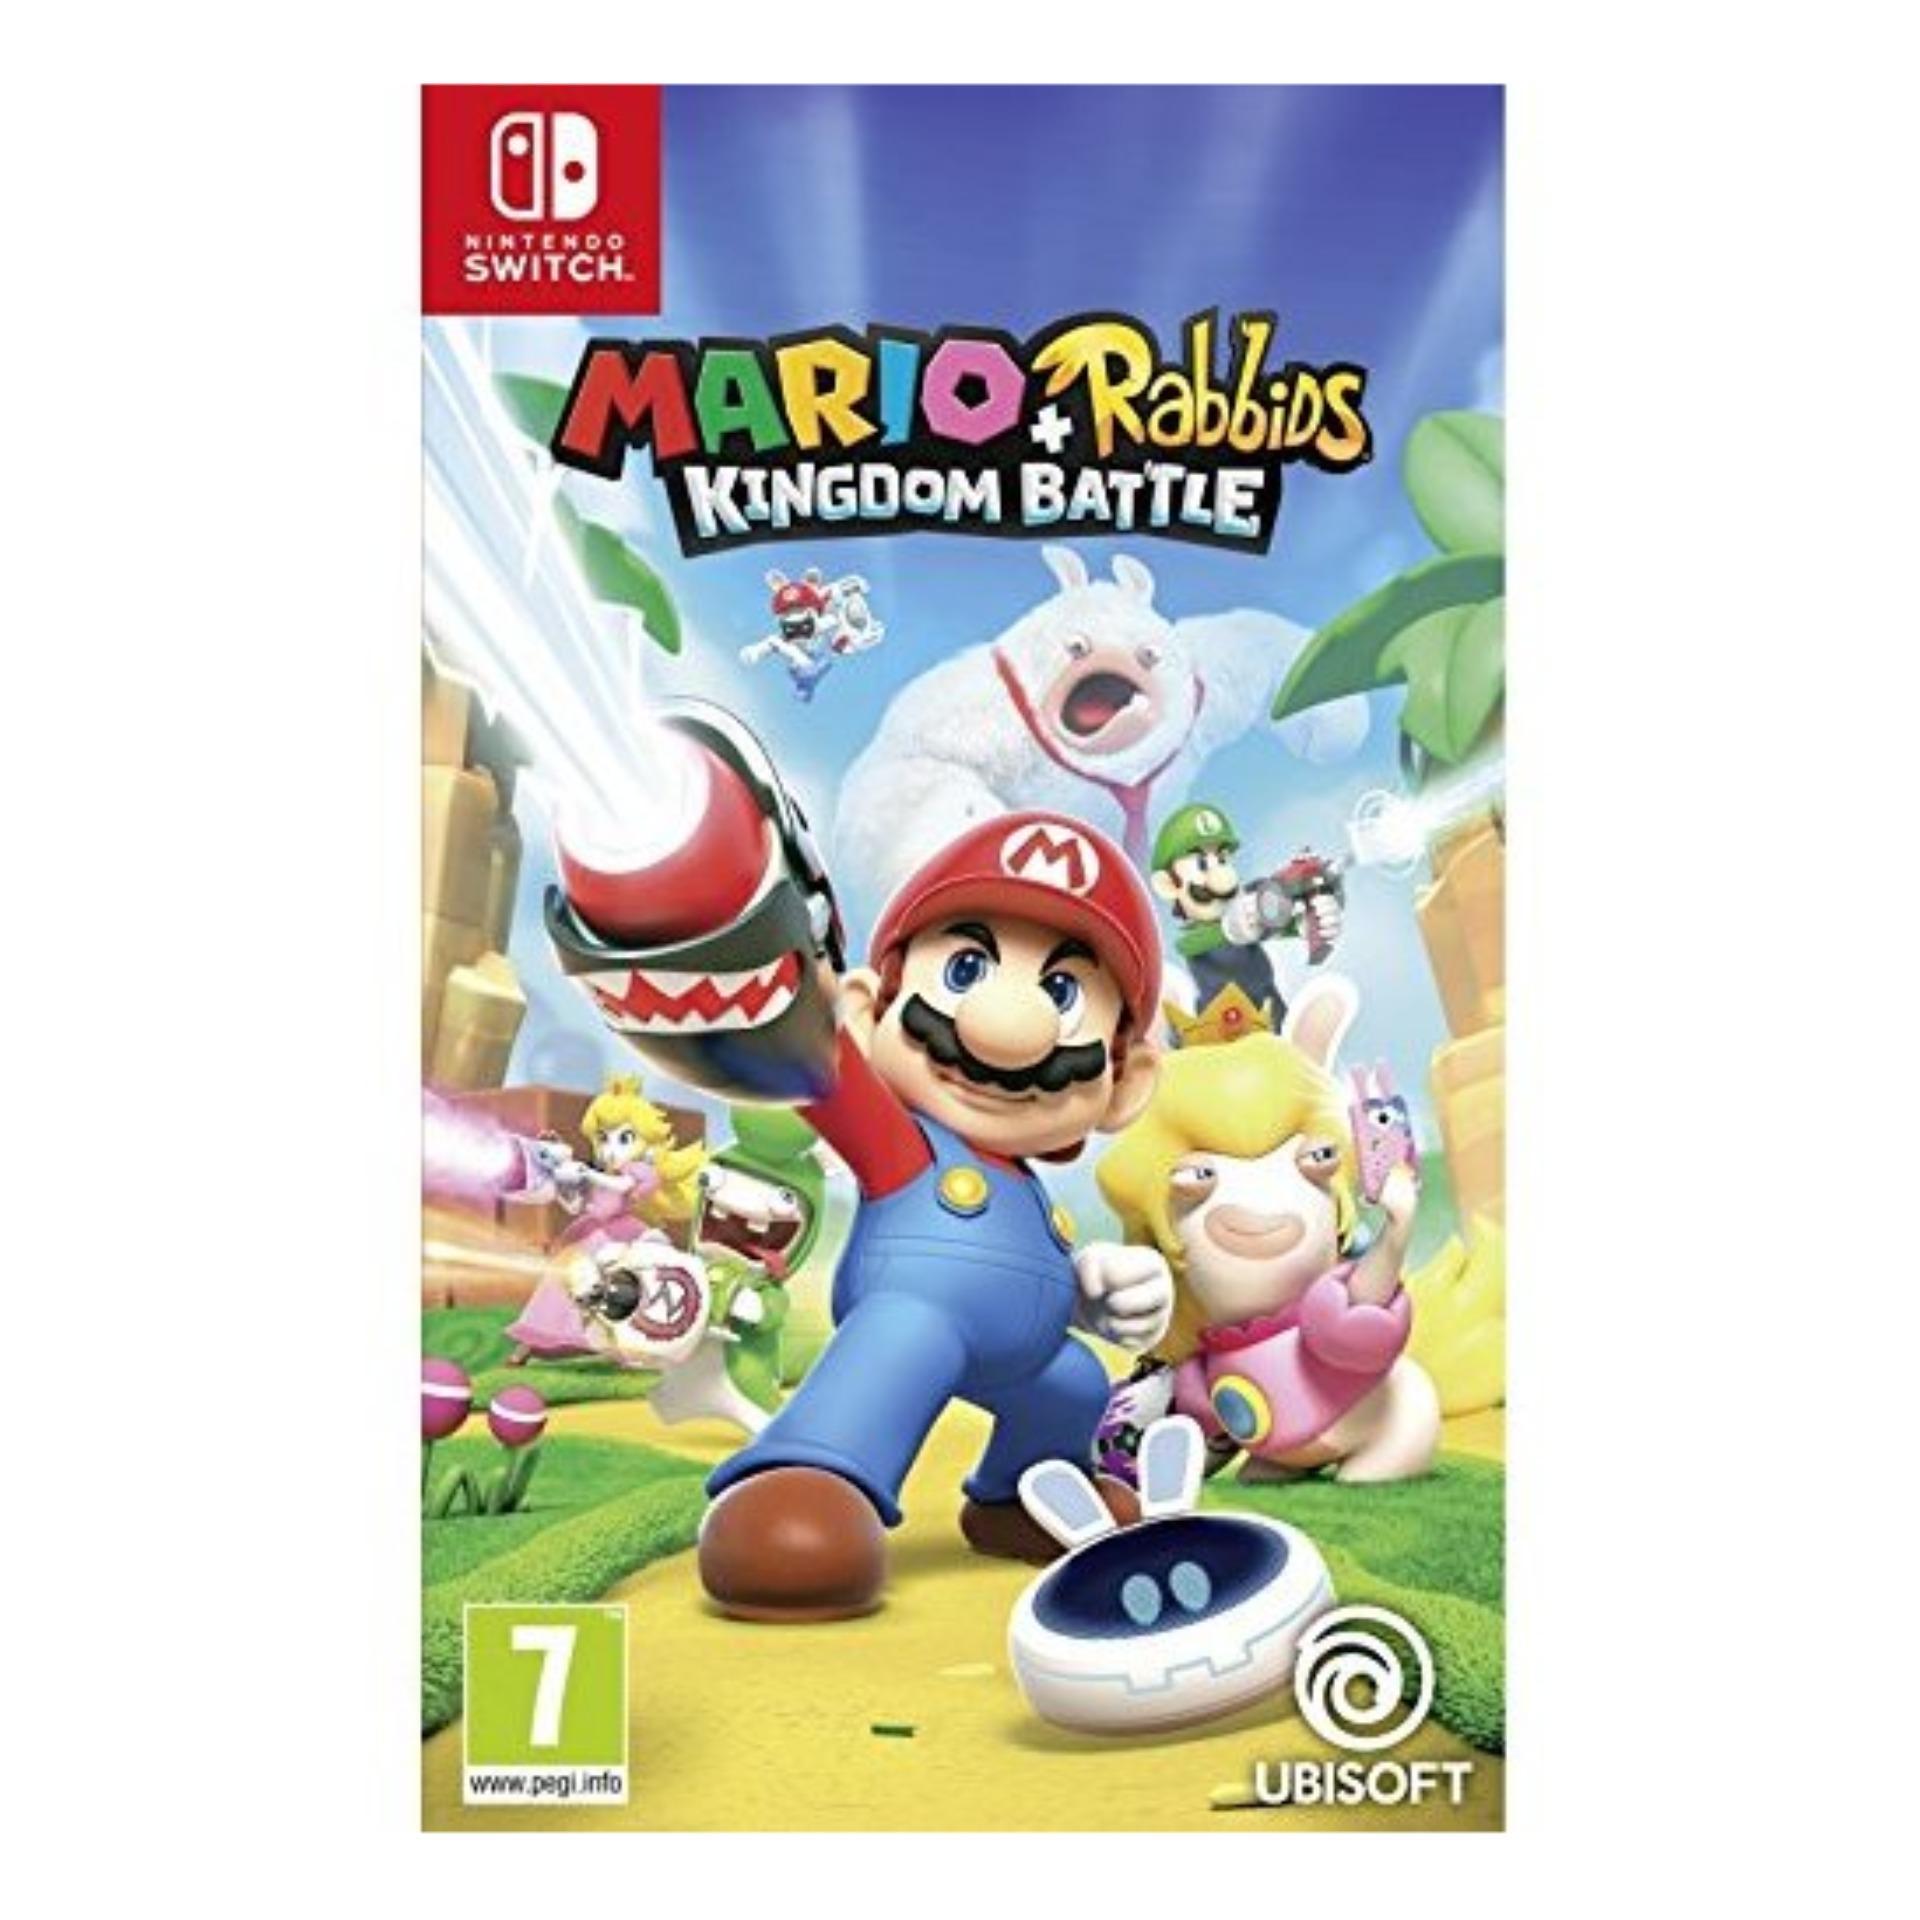 Nintendo Switch Mario + Rabbids : Kingdom Battle (English)